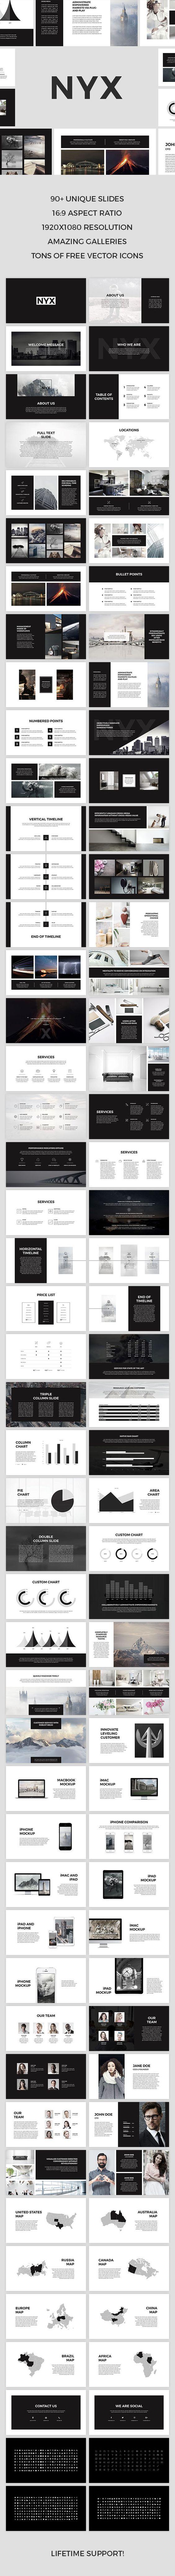 Nyx Keynote Template — Keynote KEY #best keynote templates #business • Download ➝ https://graphicriver.net/item/nyx-keynote-template/18918442?ref=pxcr